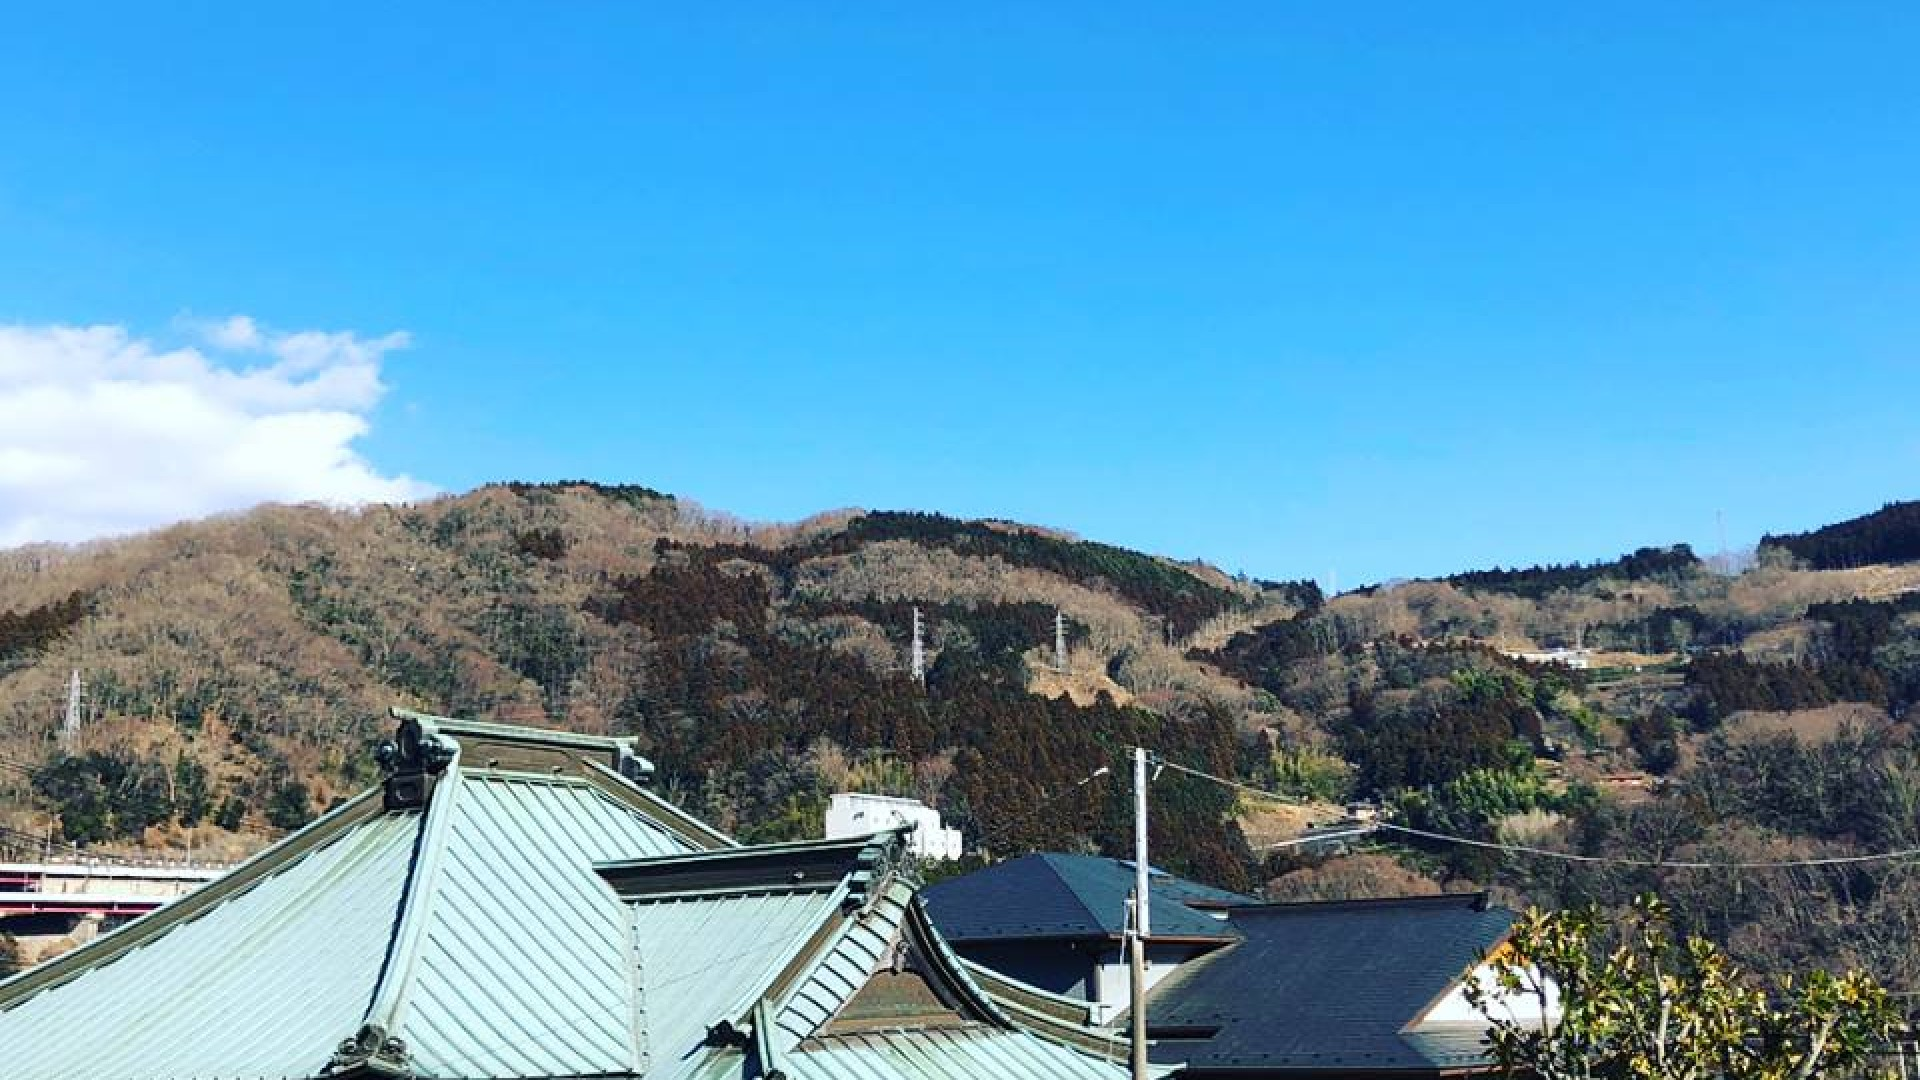 Temple Entsuuji